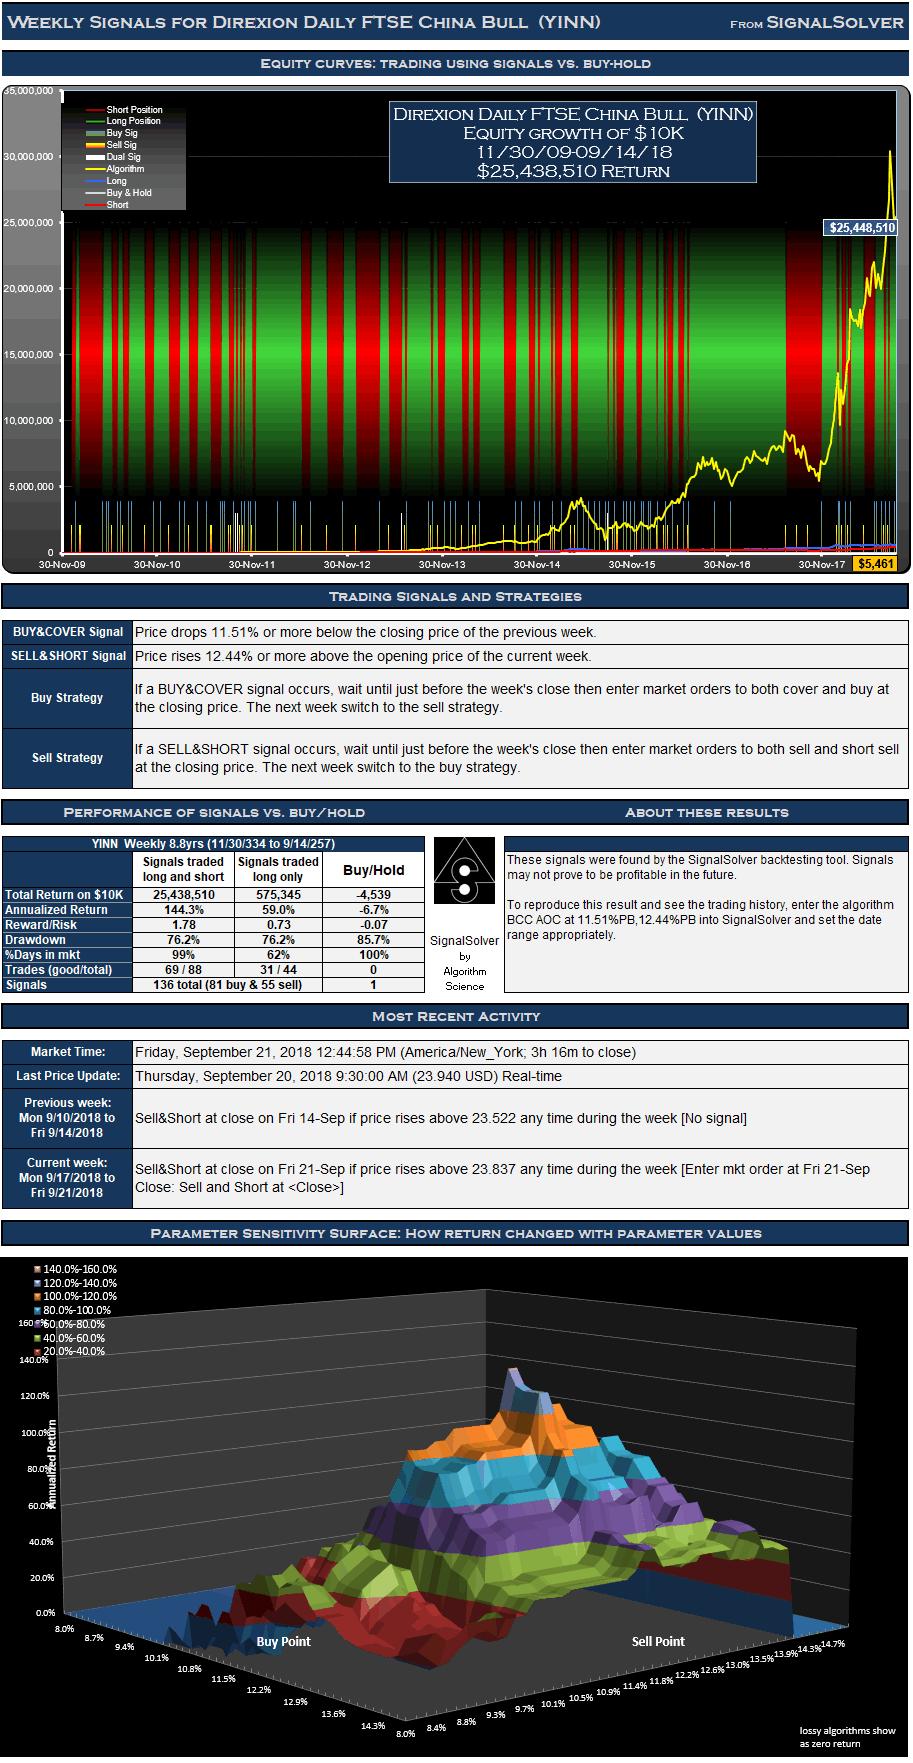 YINN Signals Weekly